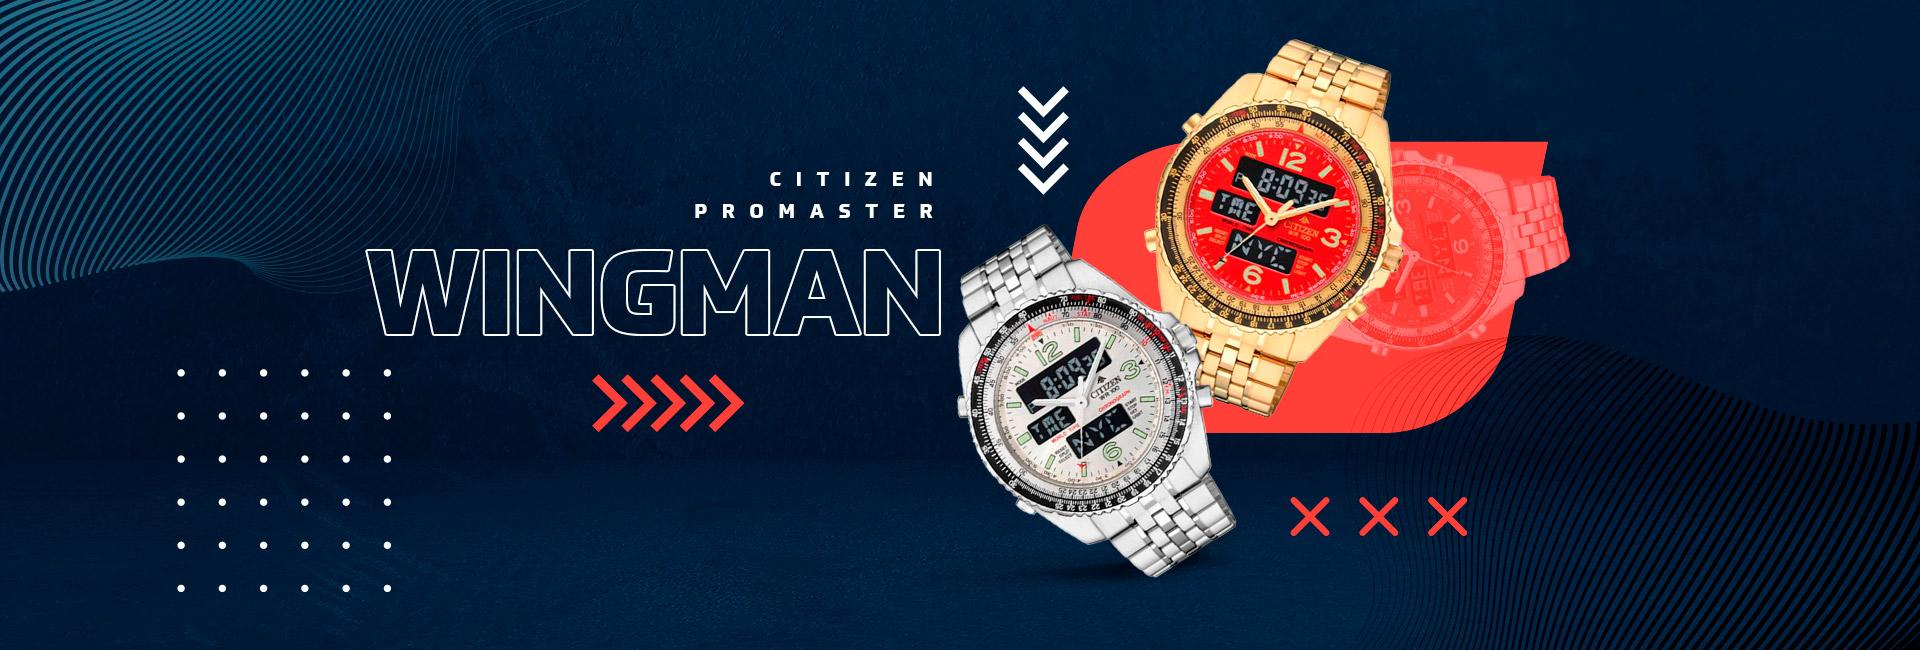 Citizen Wingman